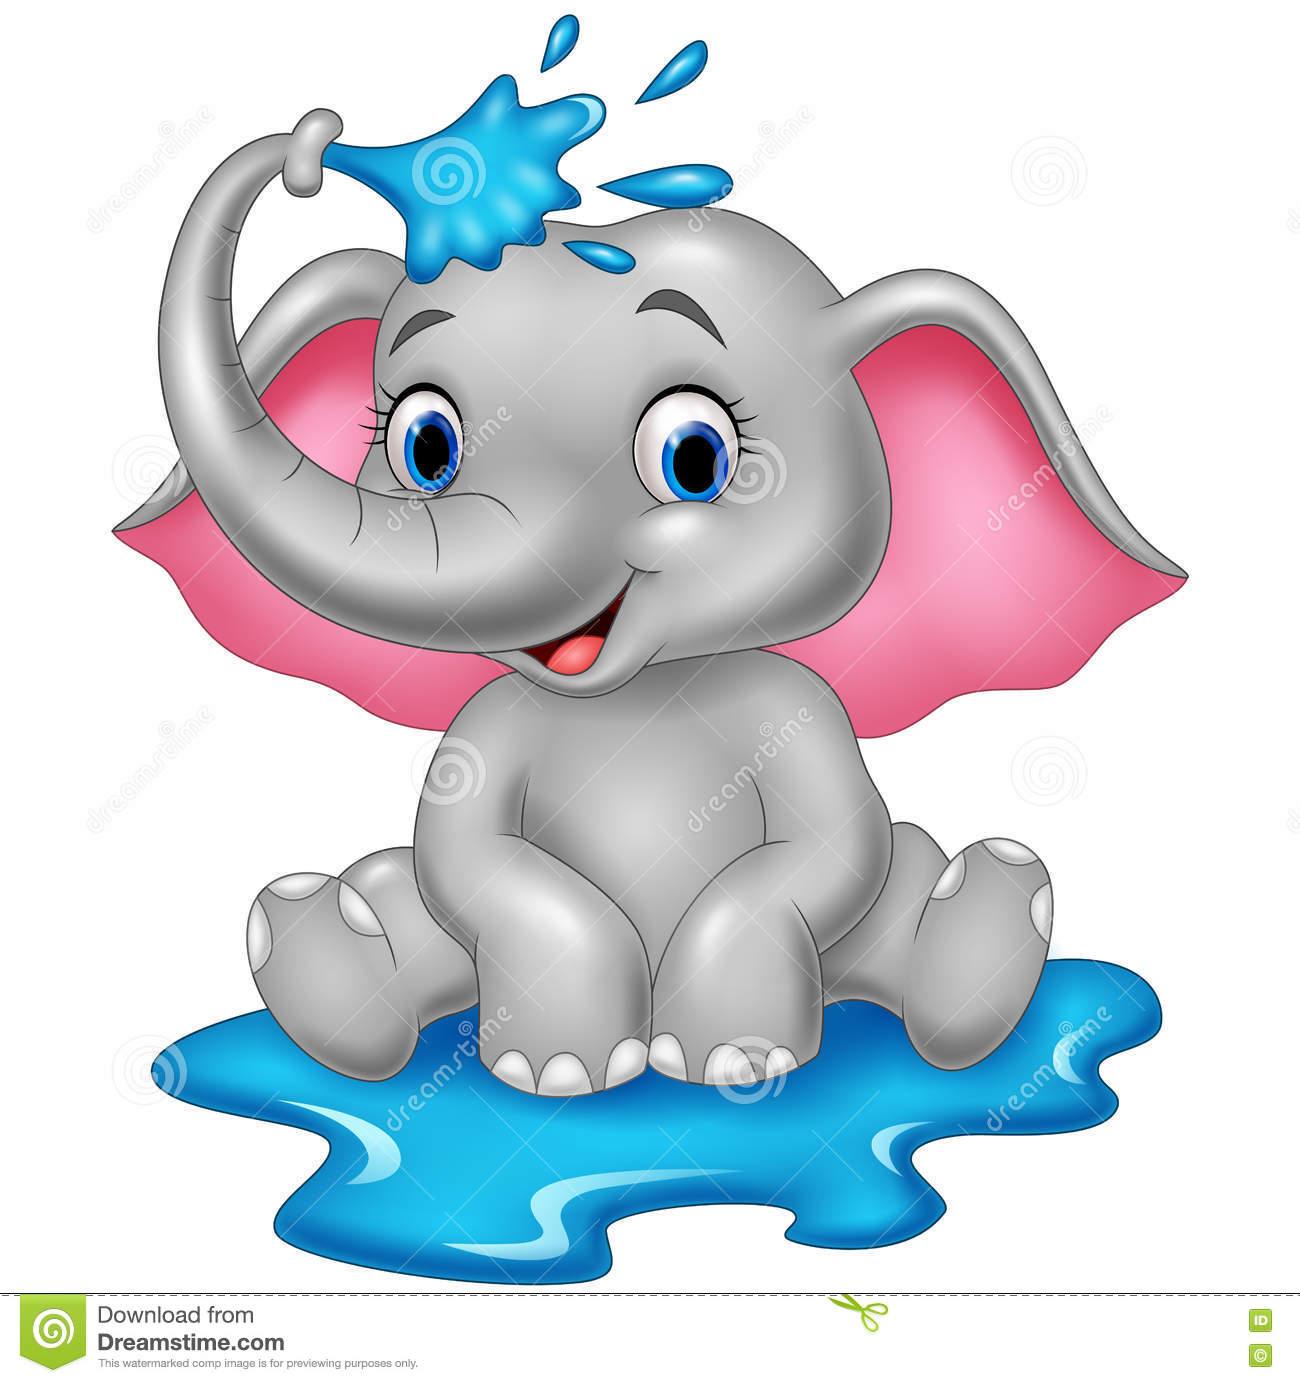 Cartoon Funny Elephant Spraying Water Stock Vector.